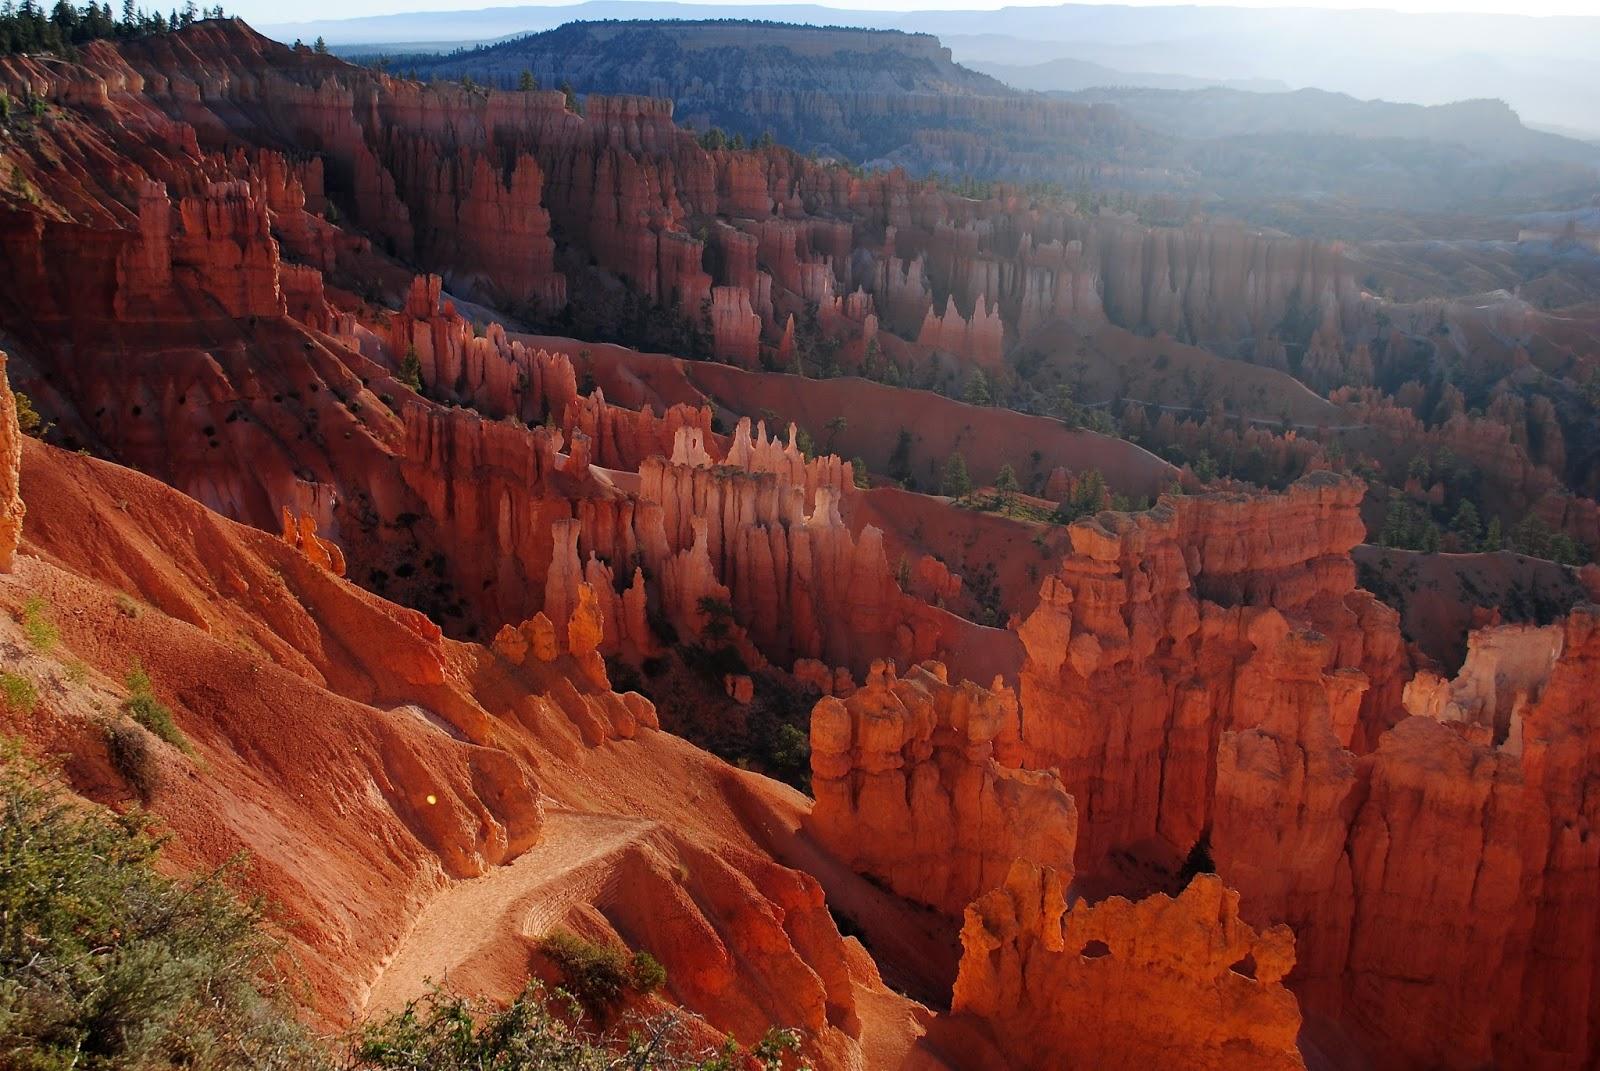 Us southwest bryce canyon ou un paysage star wars - Paysage star wars ...